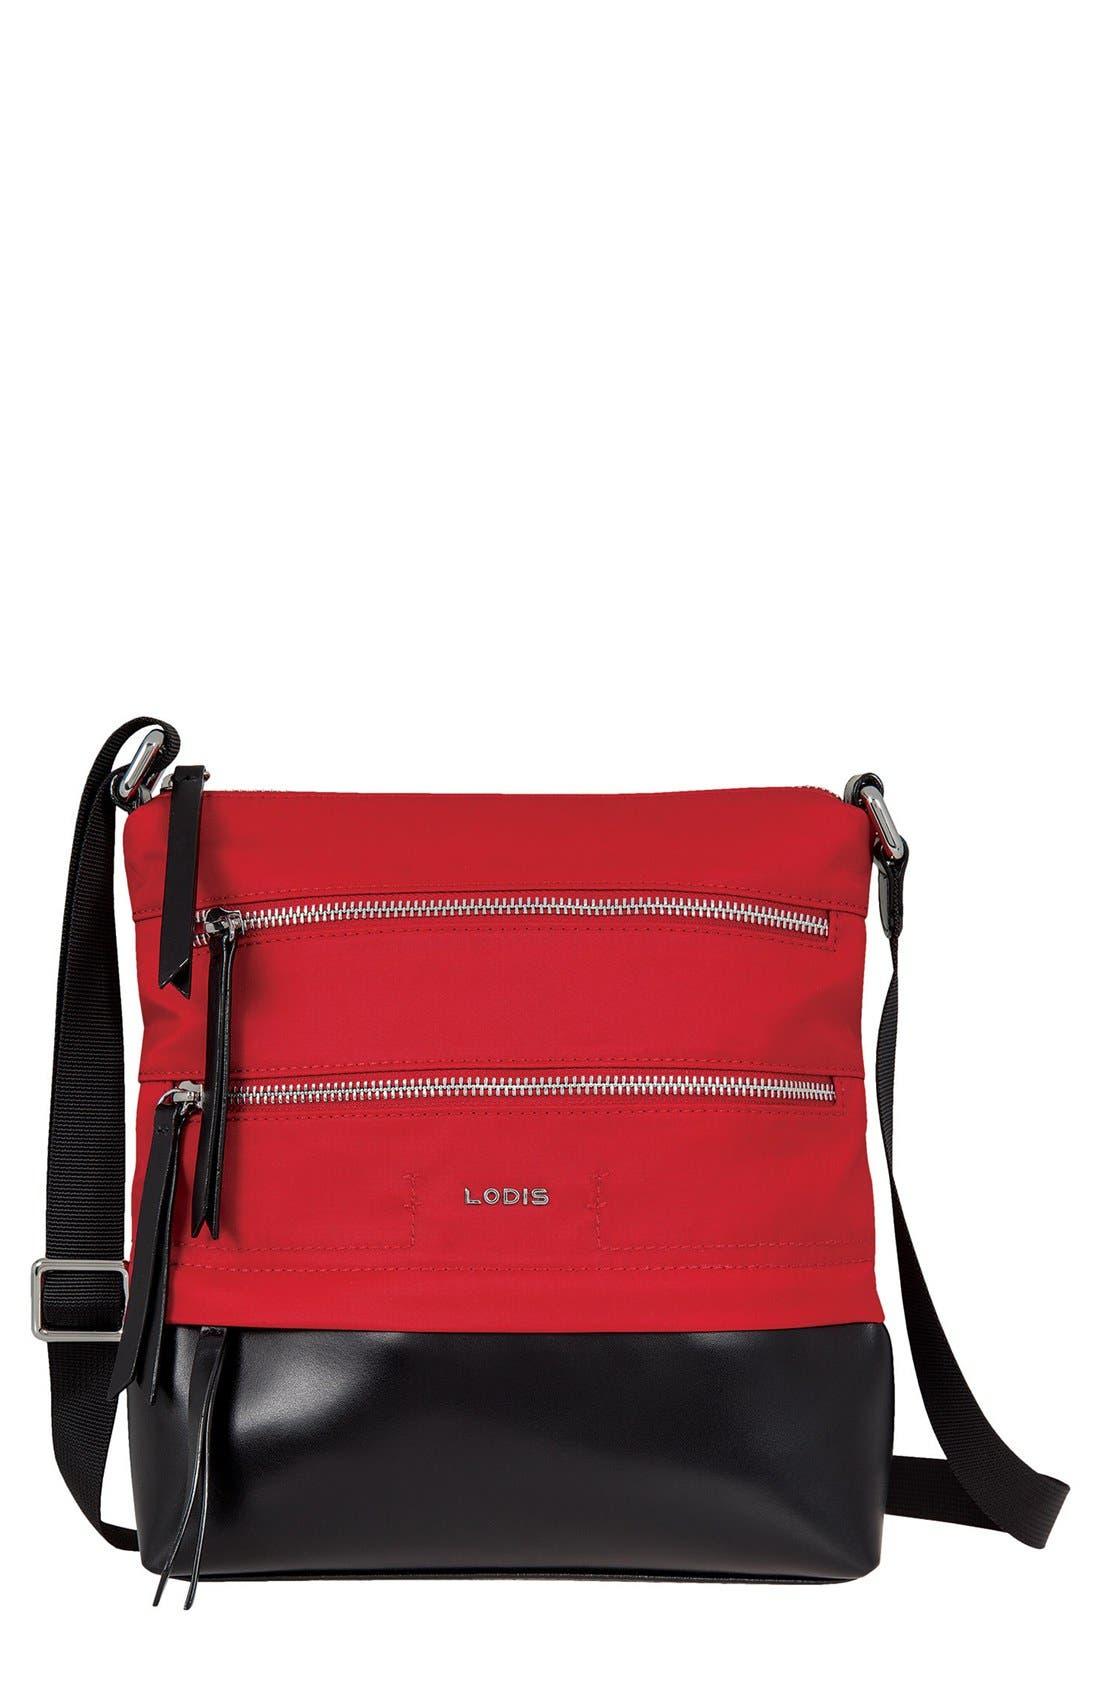 LODIS Wanda RFID Nylon & Leather Crossbody Bag